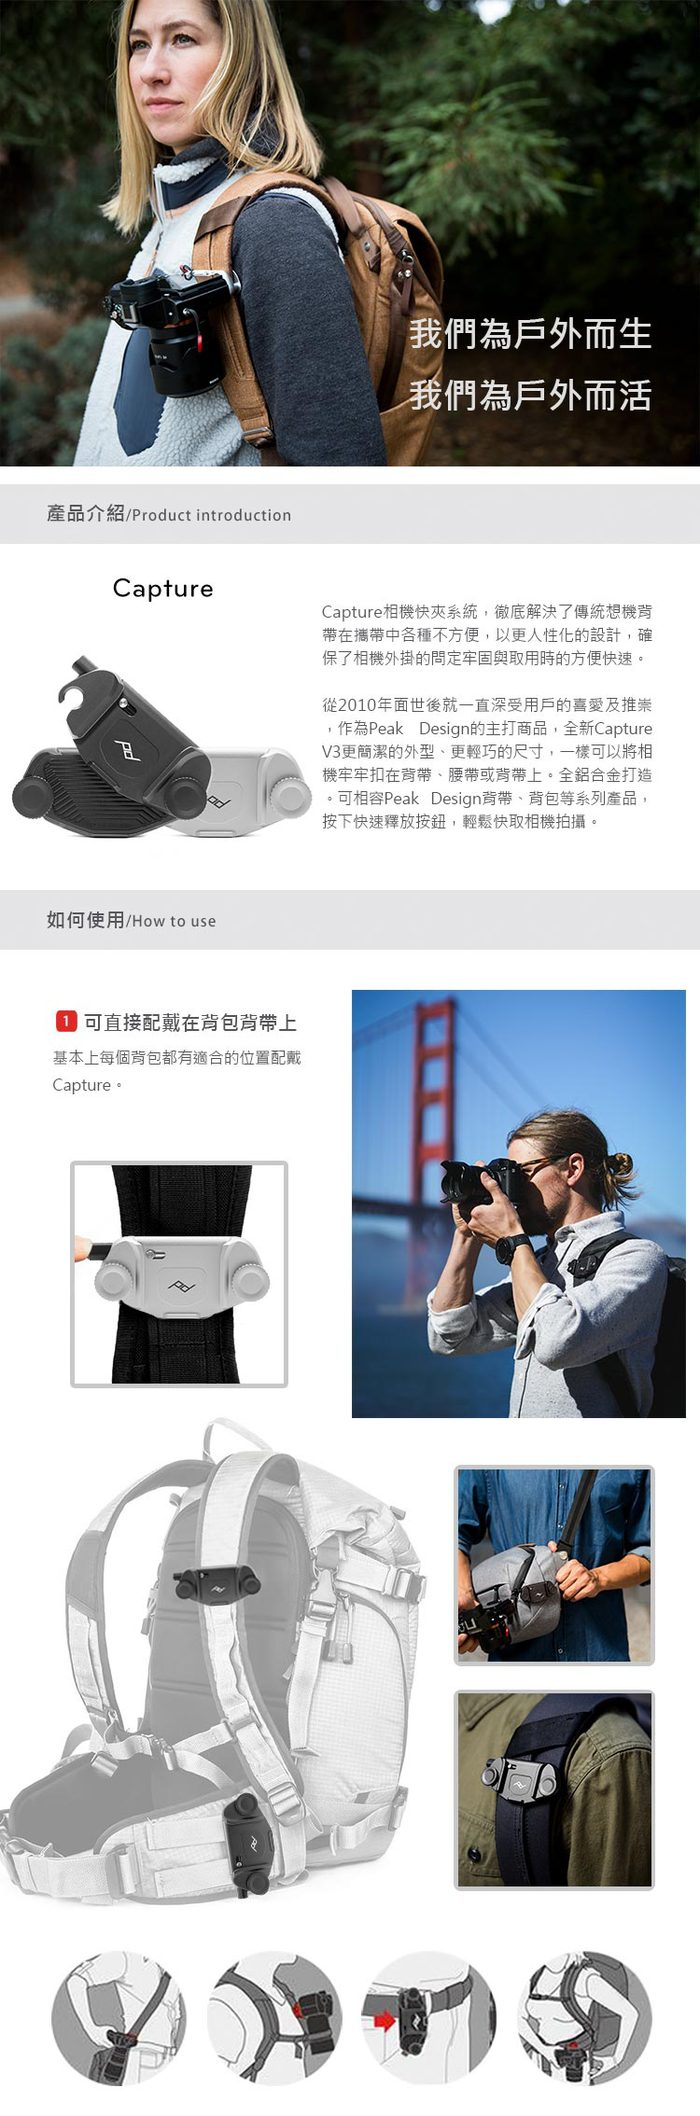 PEAK DESIGN|Capture V3 相機快夾-不含快板 (典雅黑)